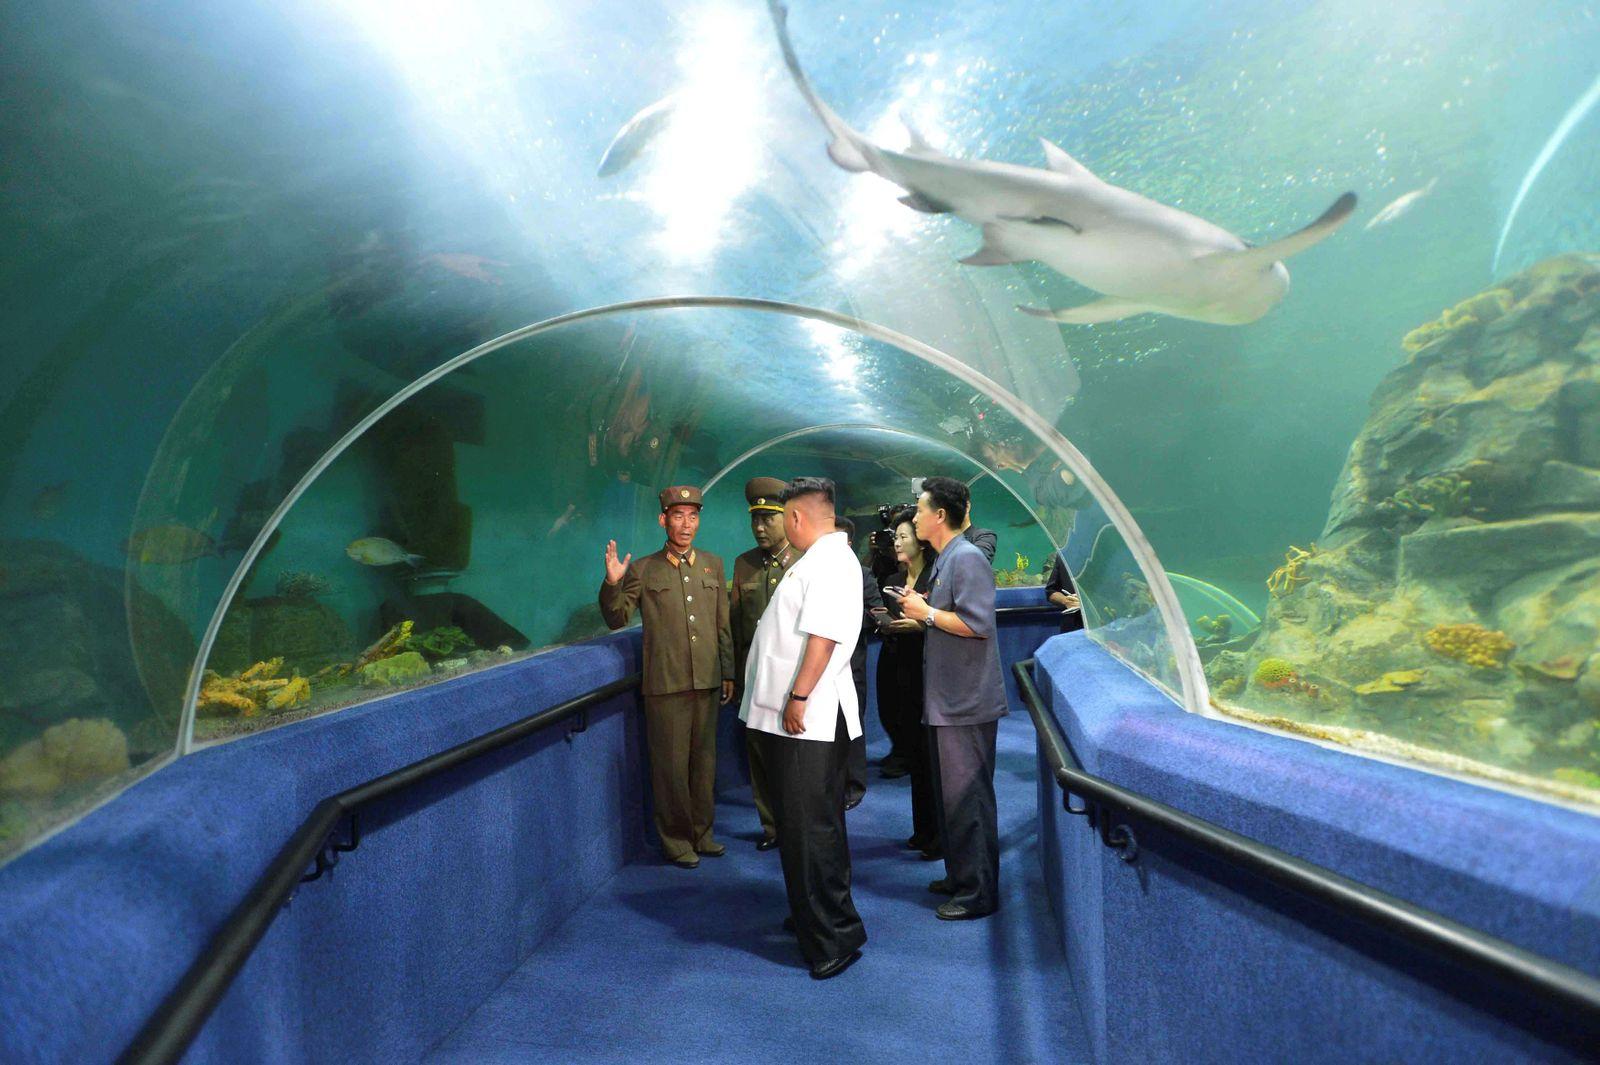 FILE PHOTO: North Korean leader Kim Jong Un visits the Songdowon International Children's Camp